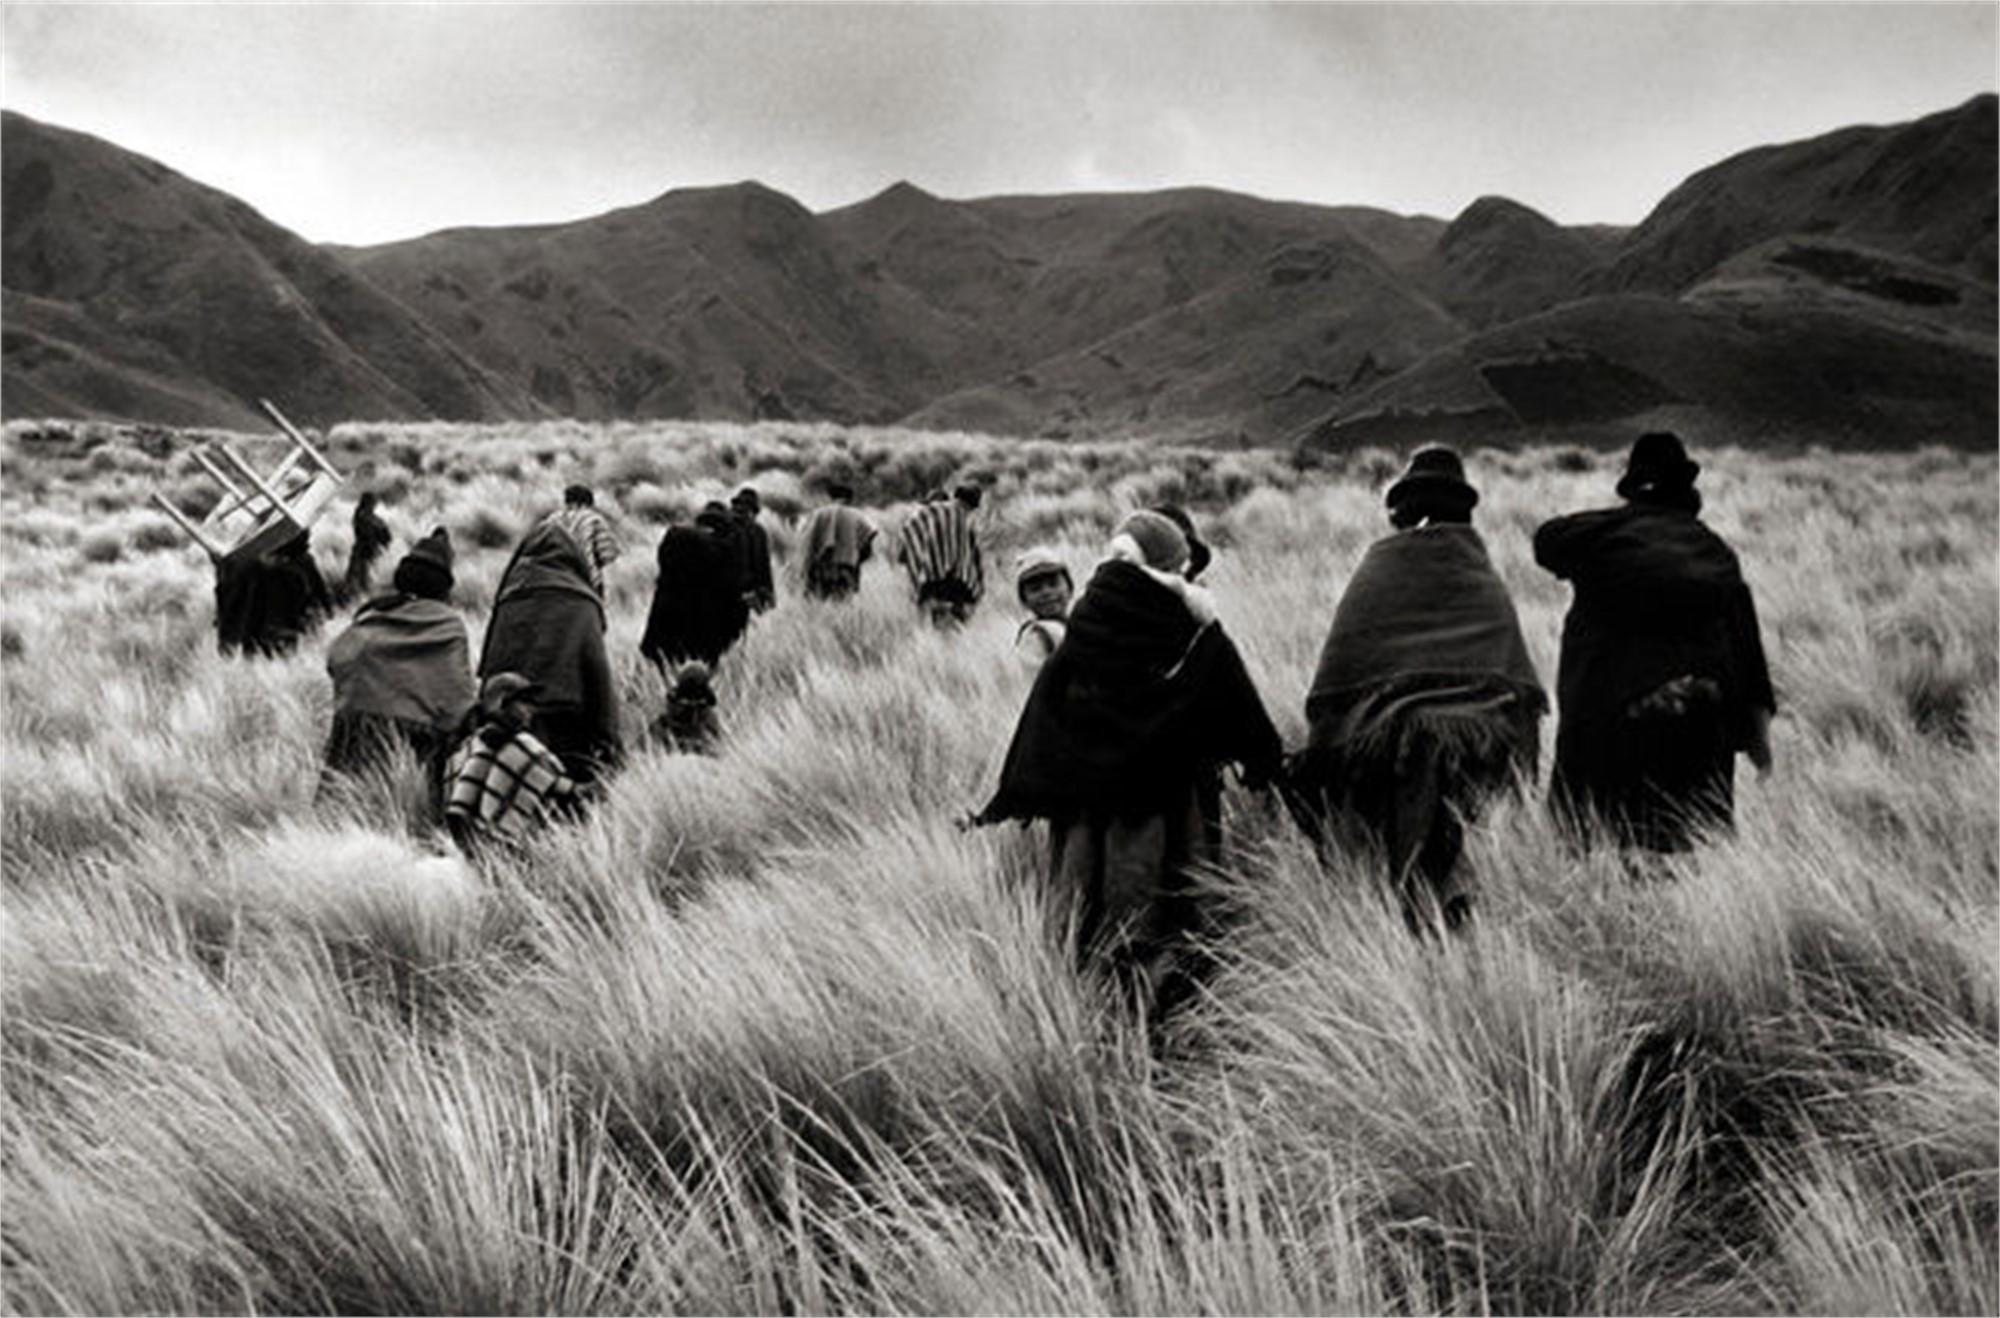 Altitlo, Chimborazo, Ecuador by Sebastiao Salgado